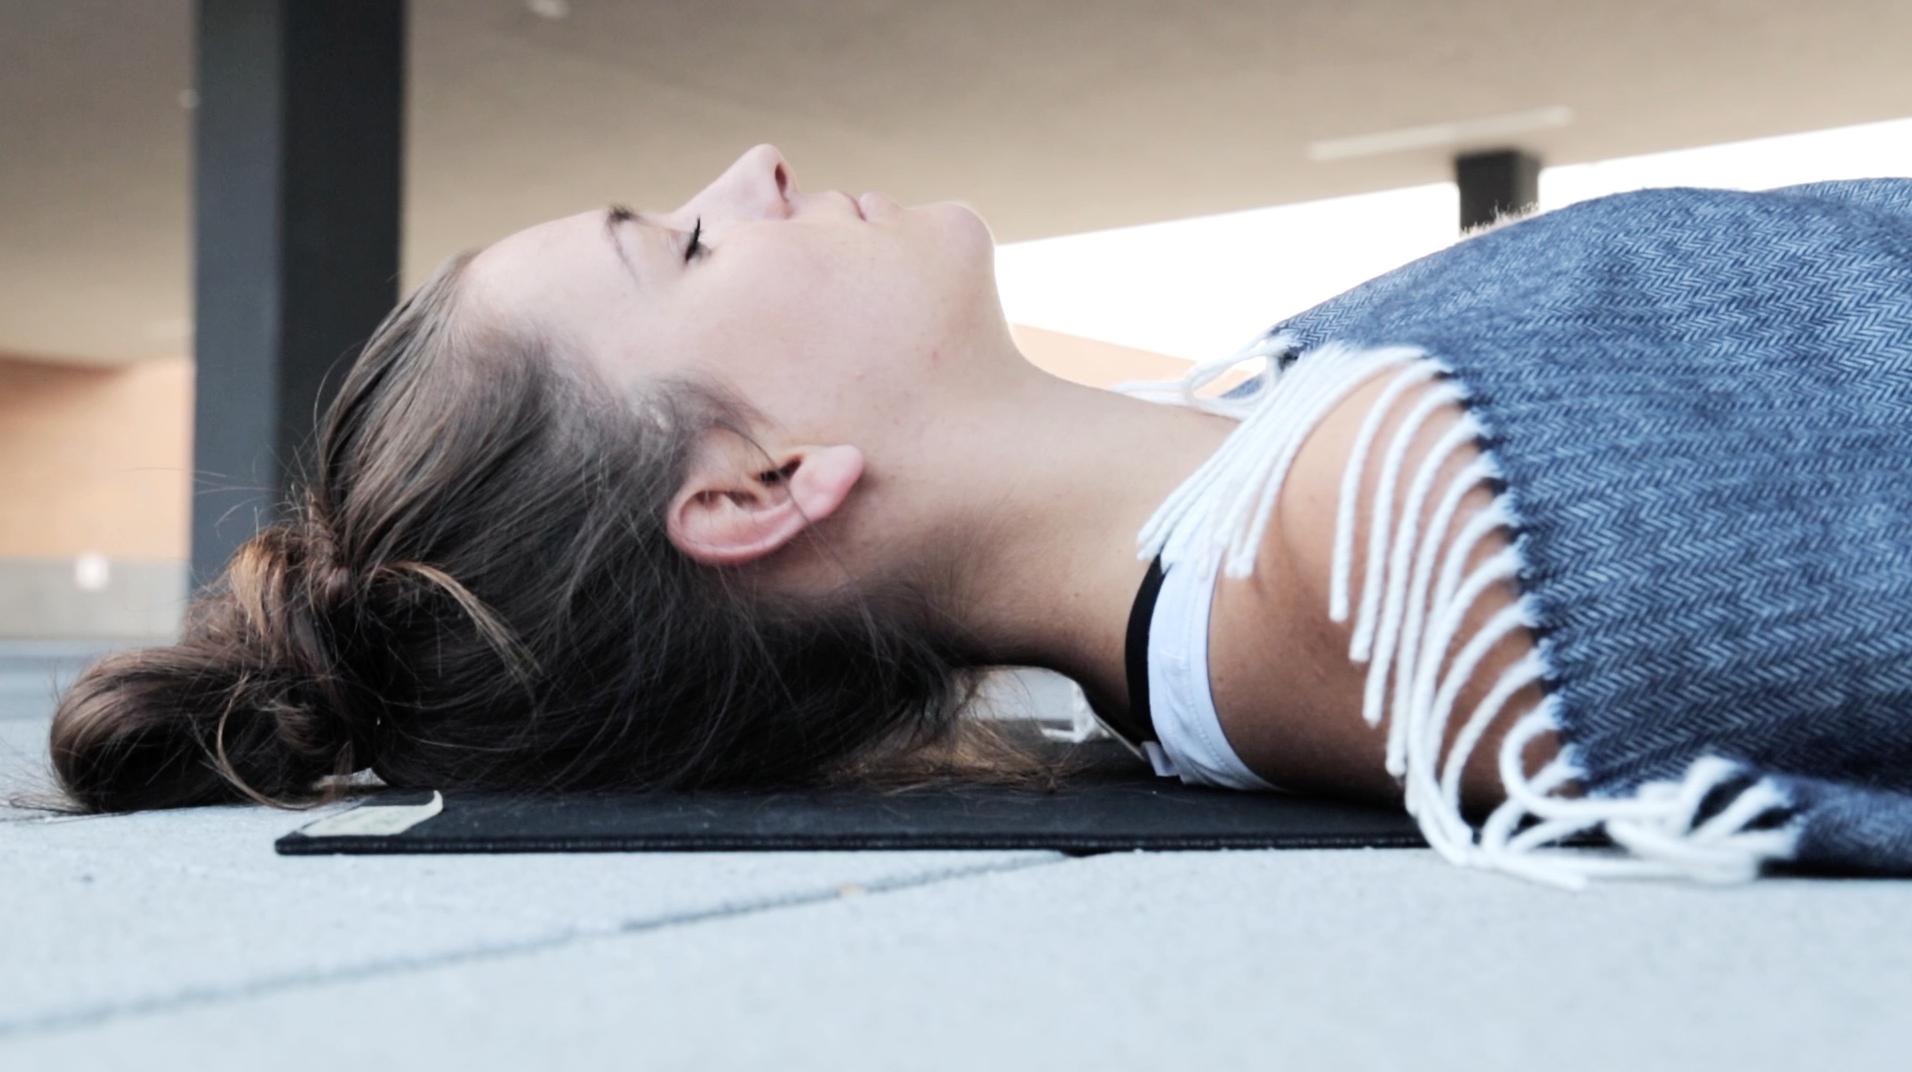 Mady-Morrison-Yoga-Vinyasa-Flow-Entspannung-Beweglichkeit-00021